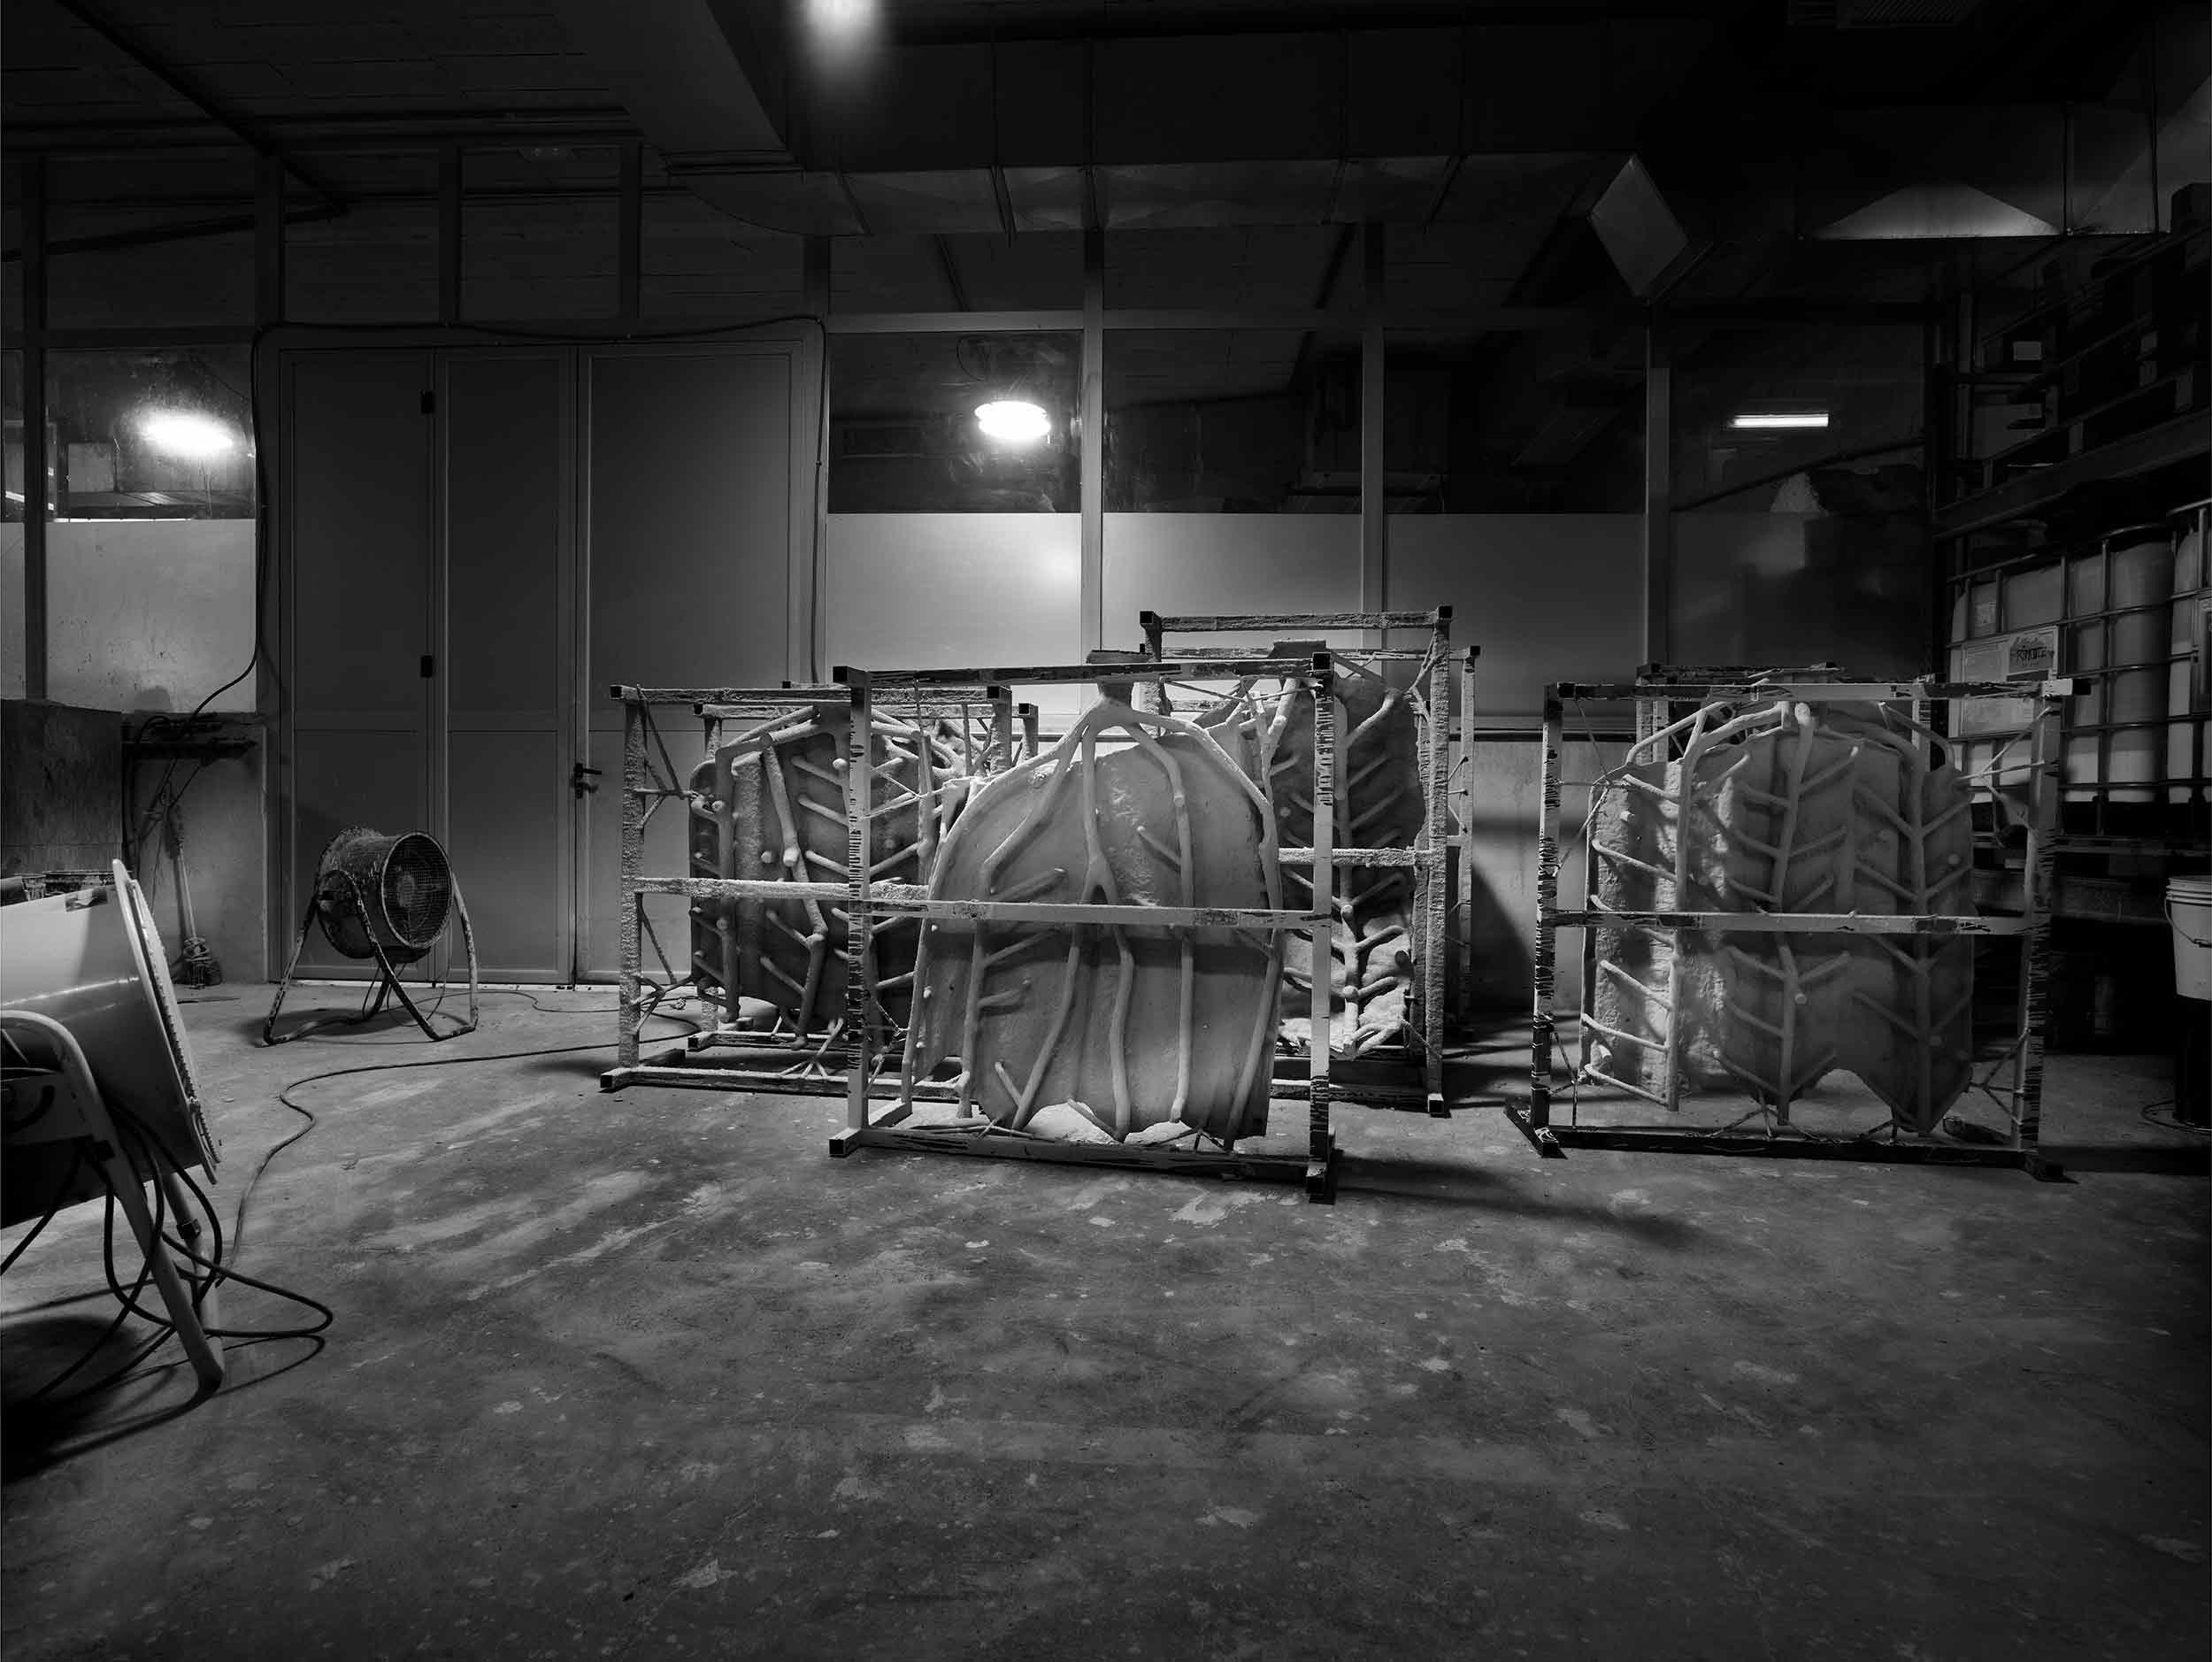 Sculpture ALYCASTRE, by Miquel Barceló, manufacturing process in Alfa Arte - Courtesy Collection Carmignac